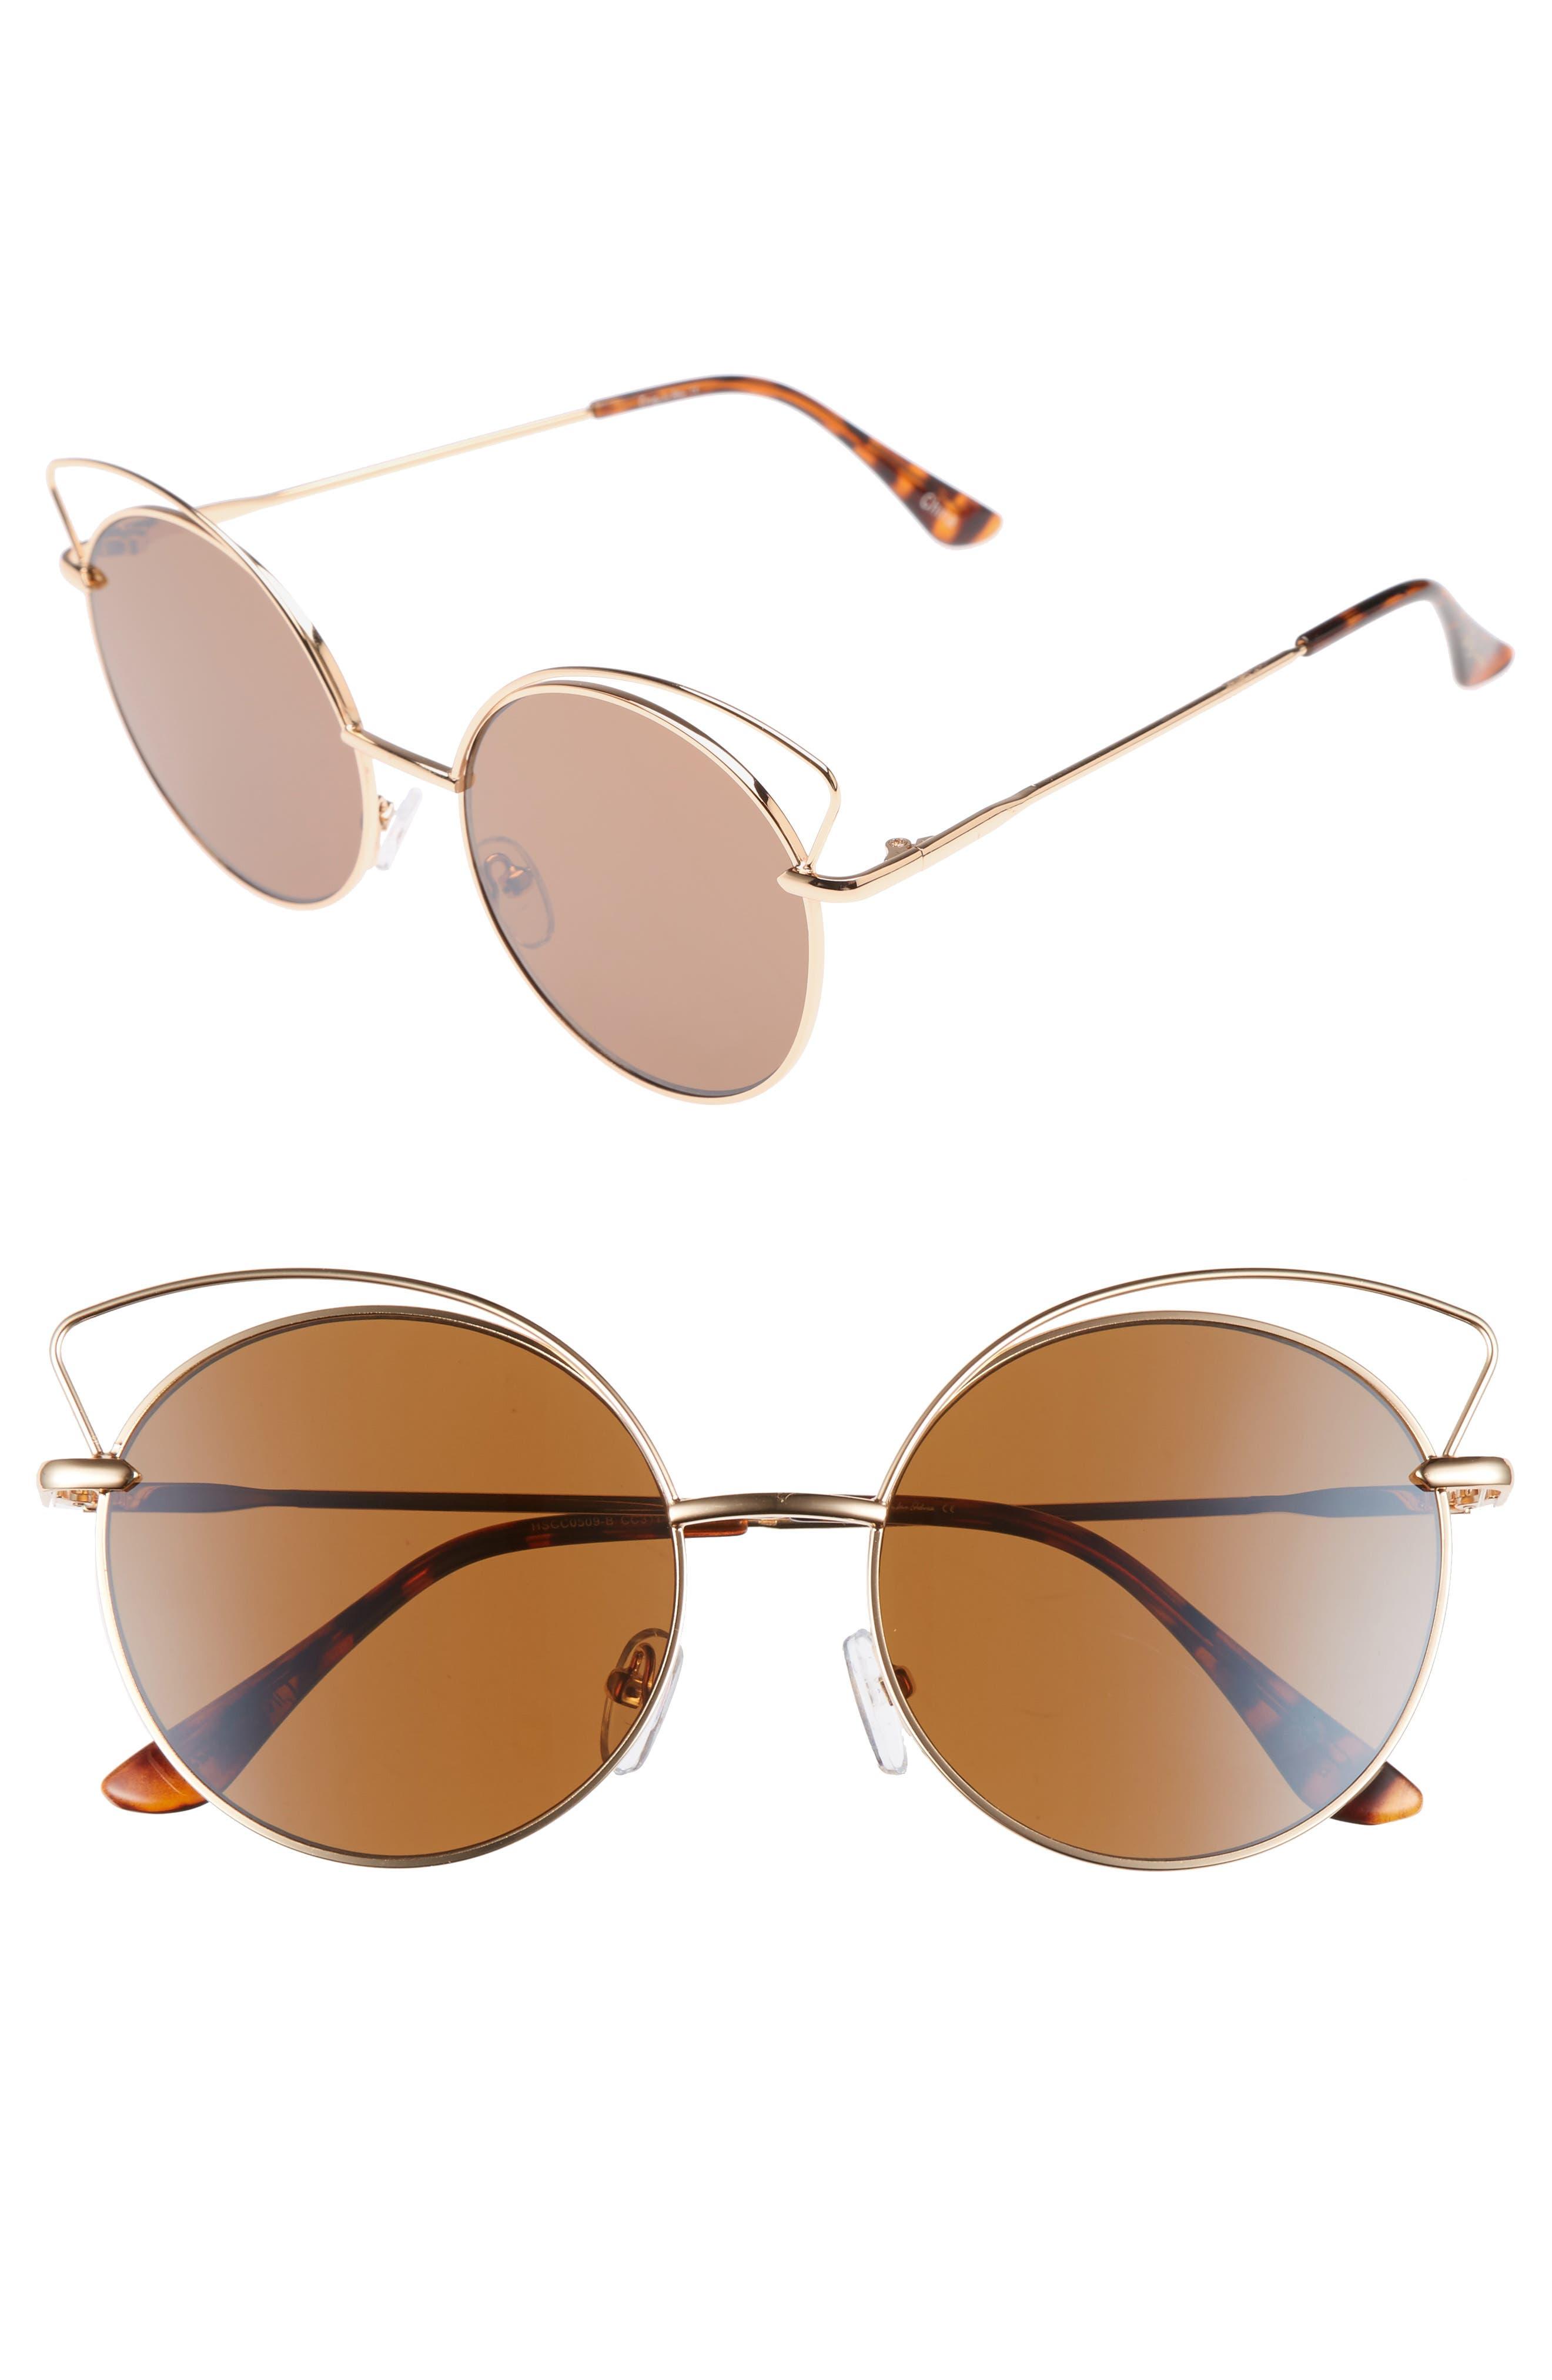 Satellite 55mm Round Sunglasses,                         Main,                         color, Gold